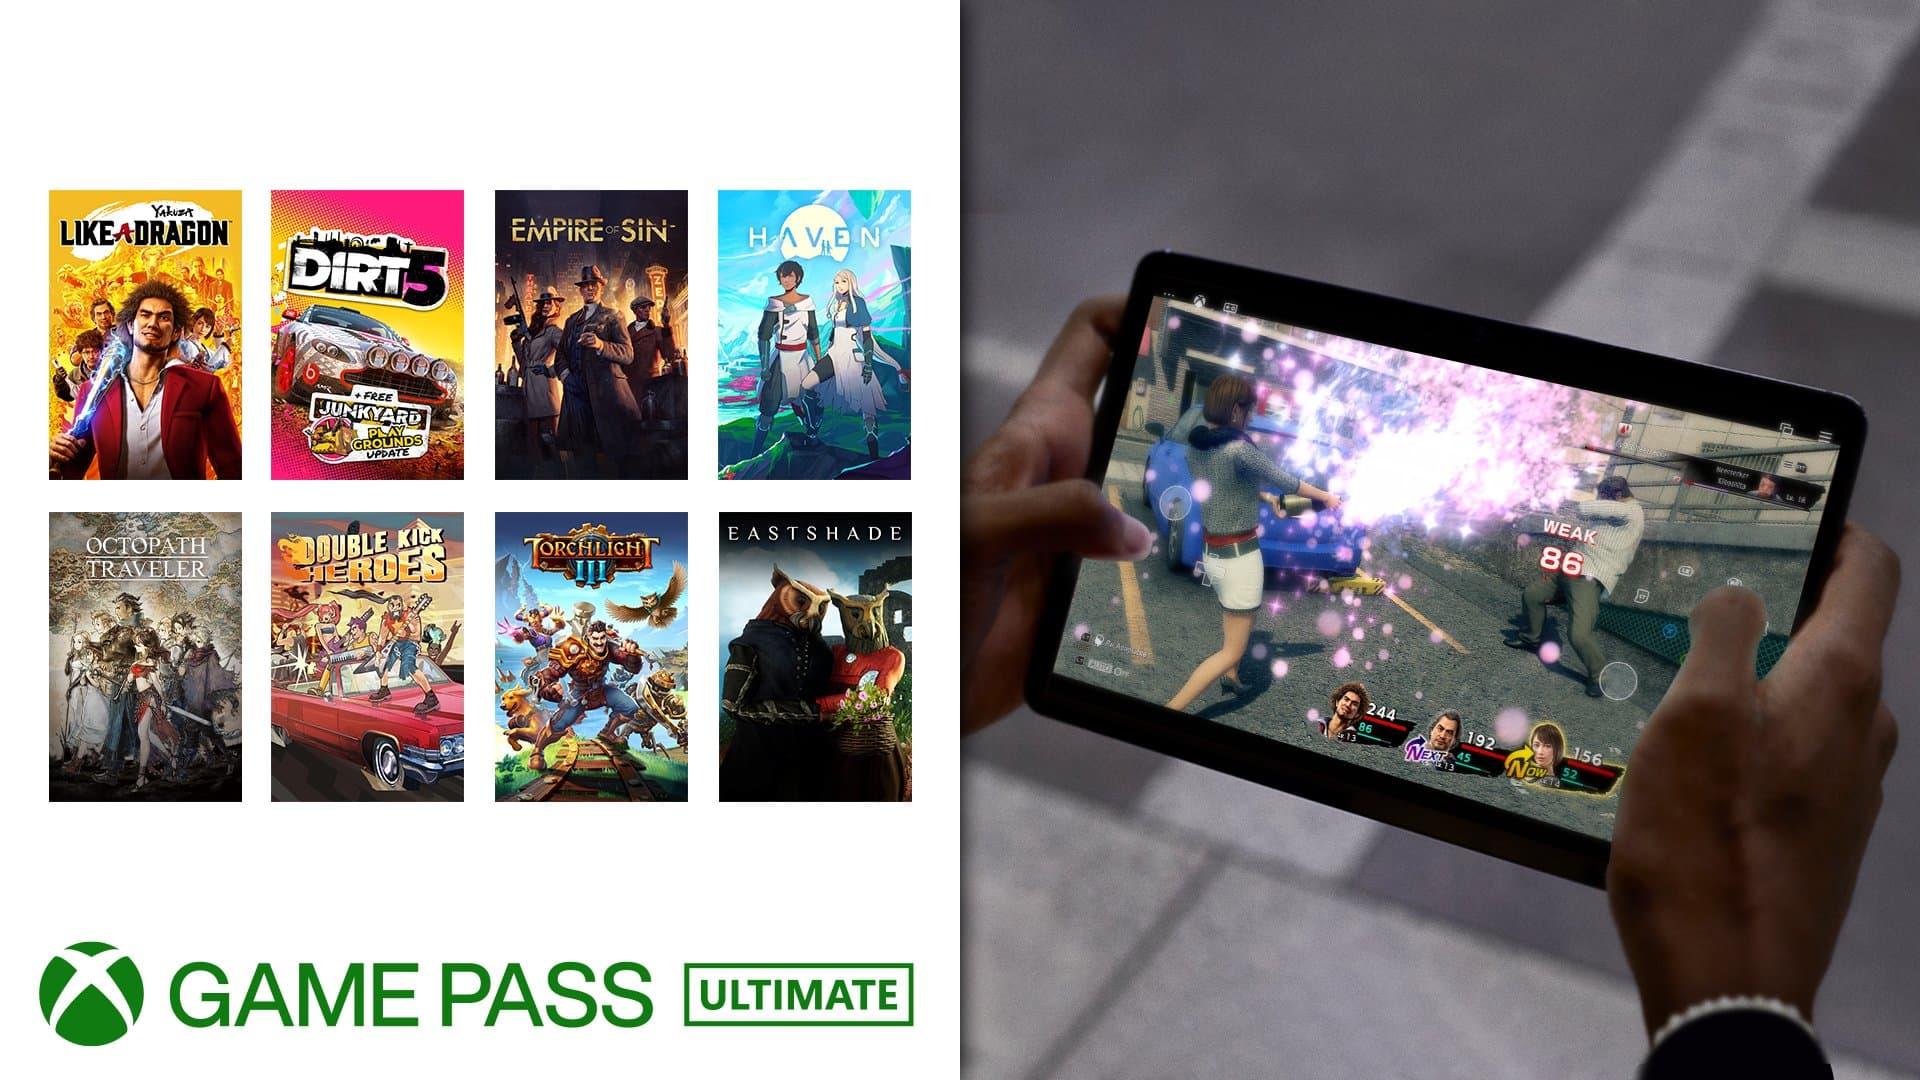 8 nuevos juegos reciben soporte para controles táctiles en xCloud